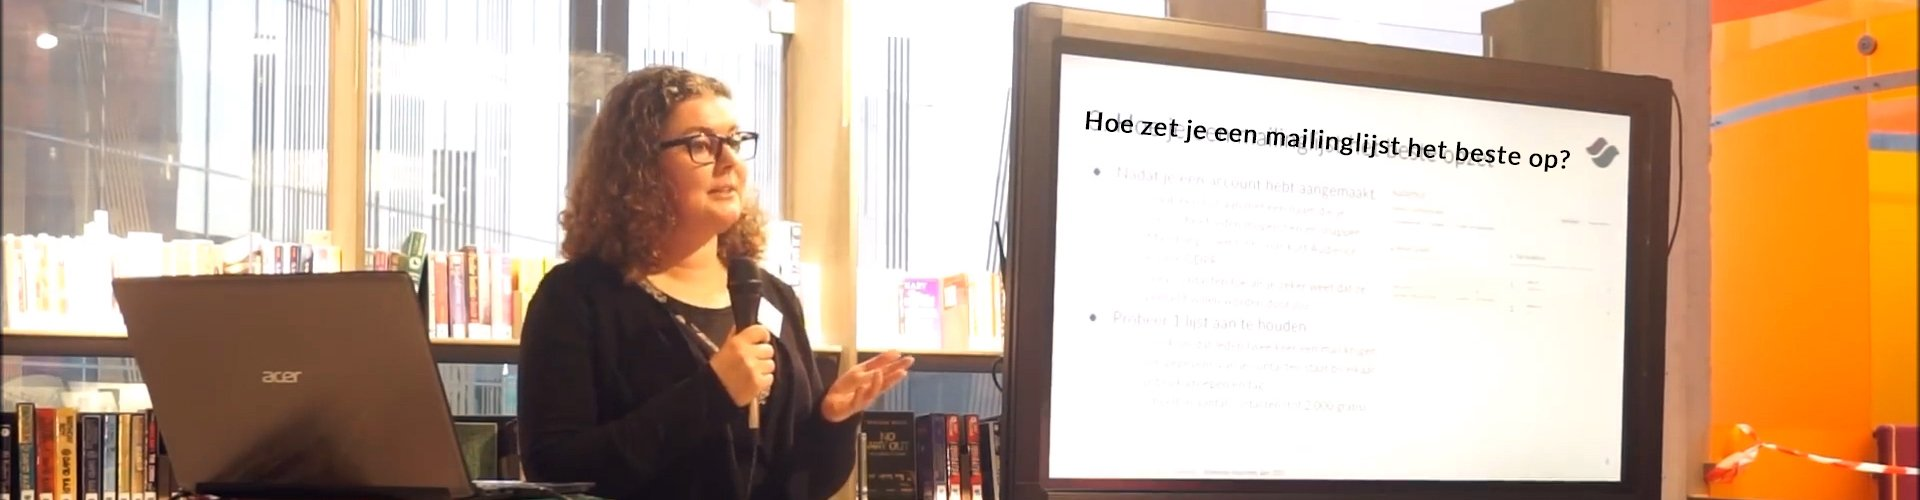 Mailchimp presentatie Saskia Smit